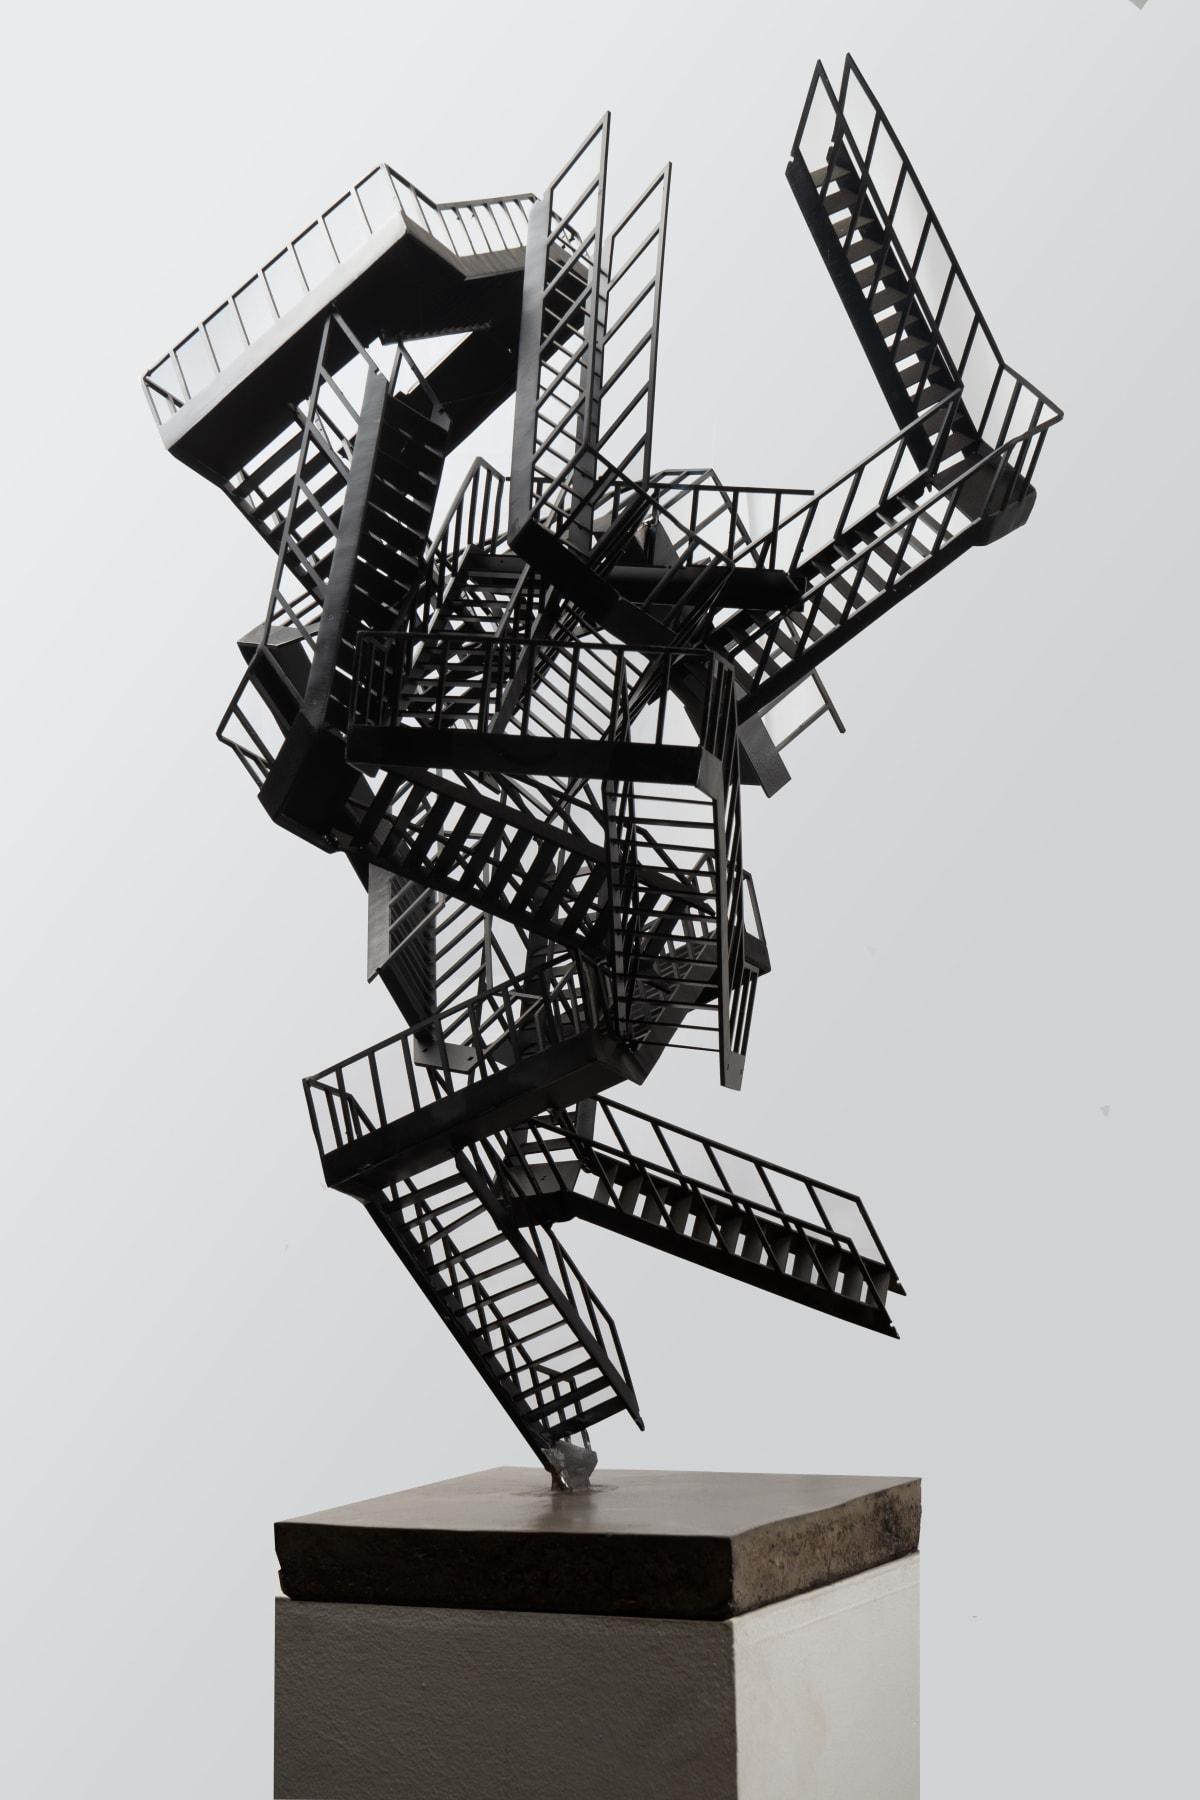 Jake Michael Singer | In Murmurs | Exhibition Opening